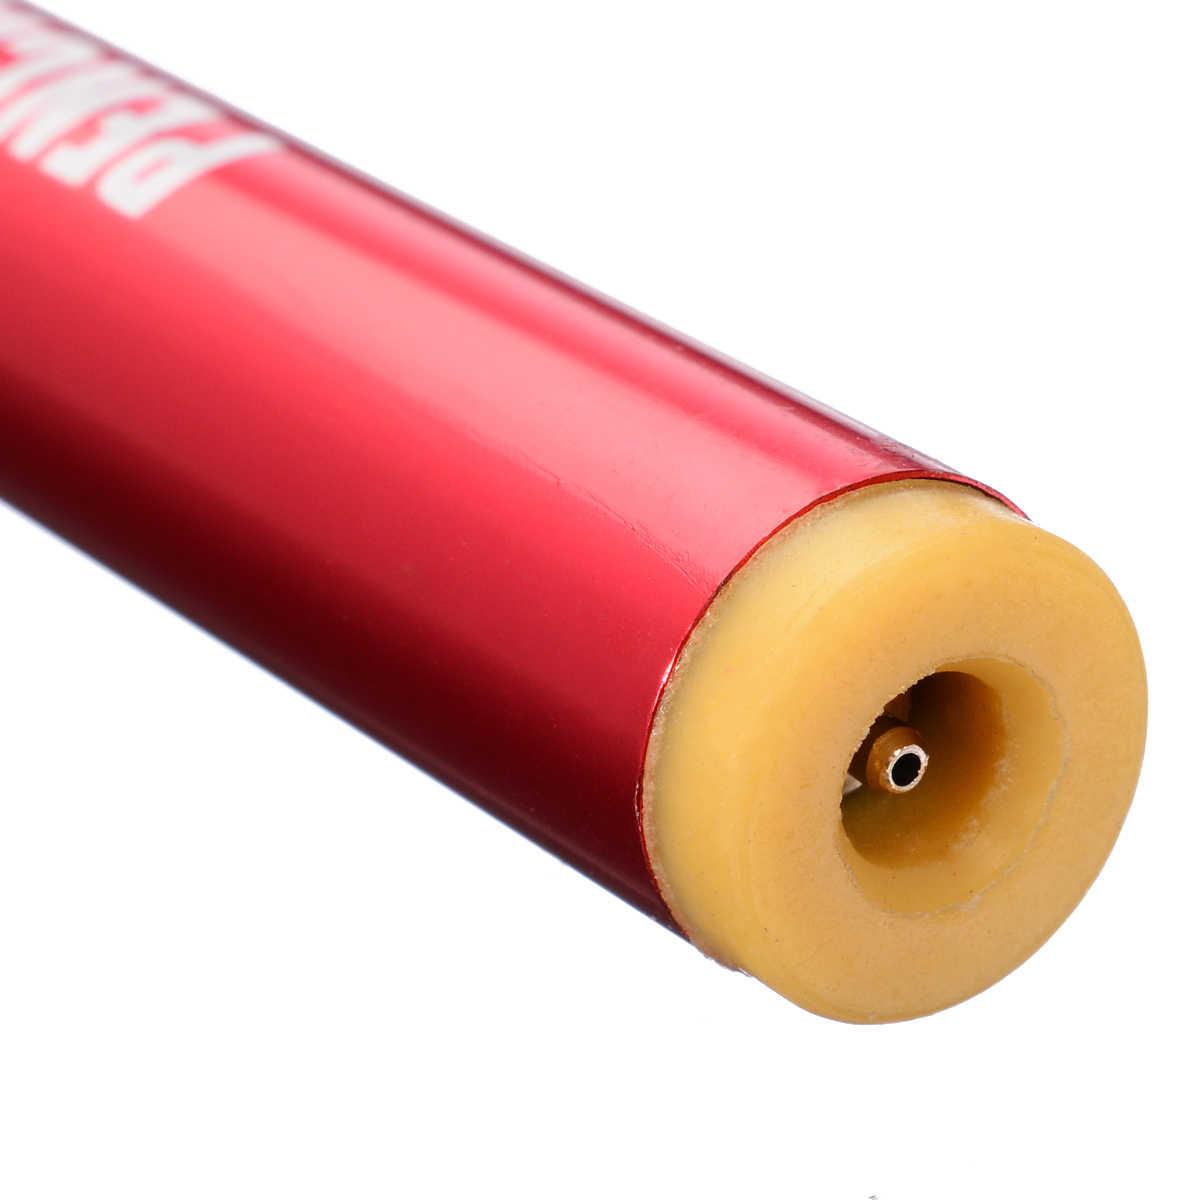 Mini Portable Welding Torch Gun Gas Blow Tool Soldering Iron Cordless Welding Pen Burner for Melting/Hot Cutting Tools